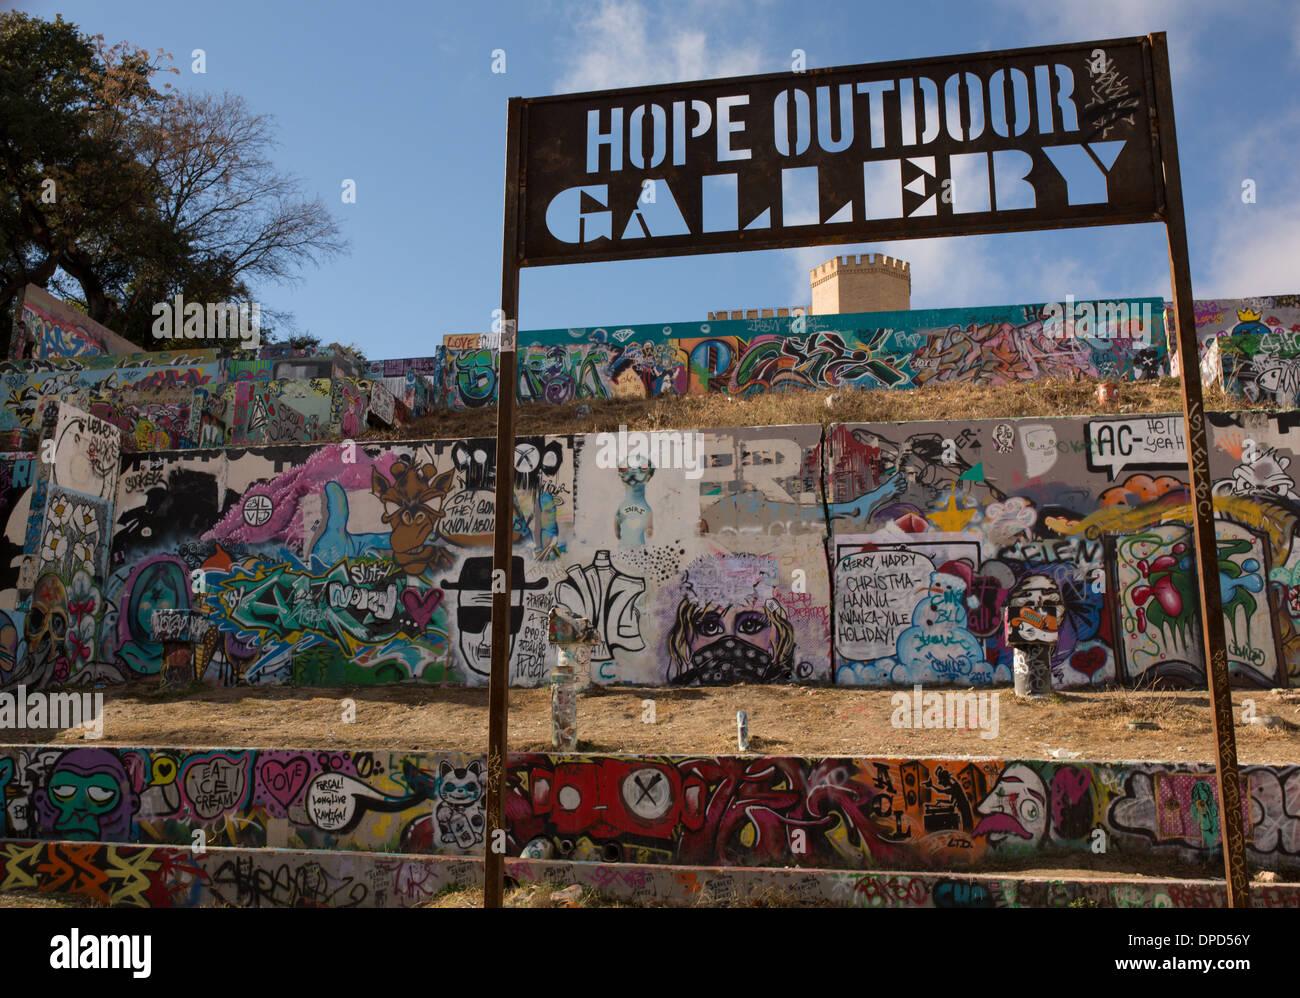 Hope outdoor gallery austin texas graffiti wall